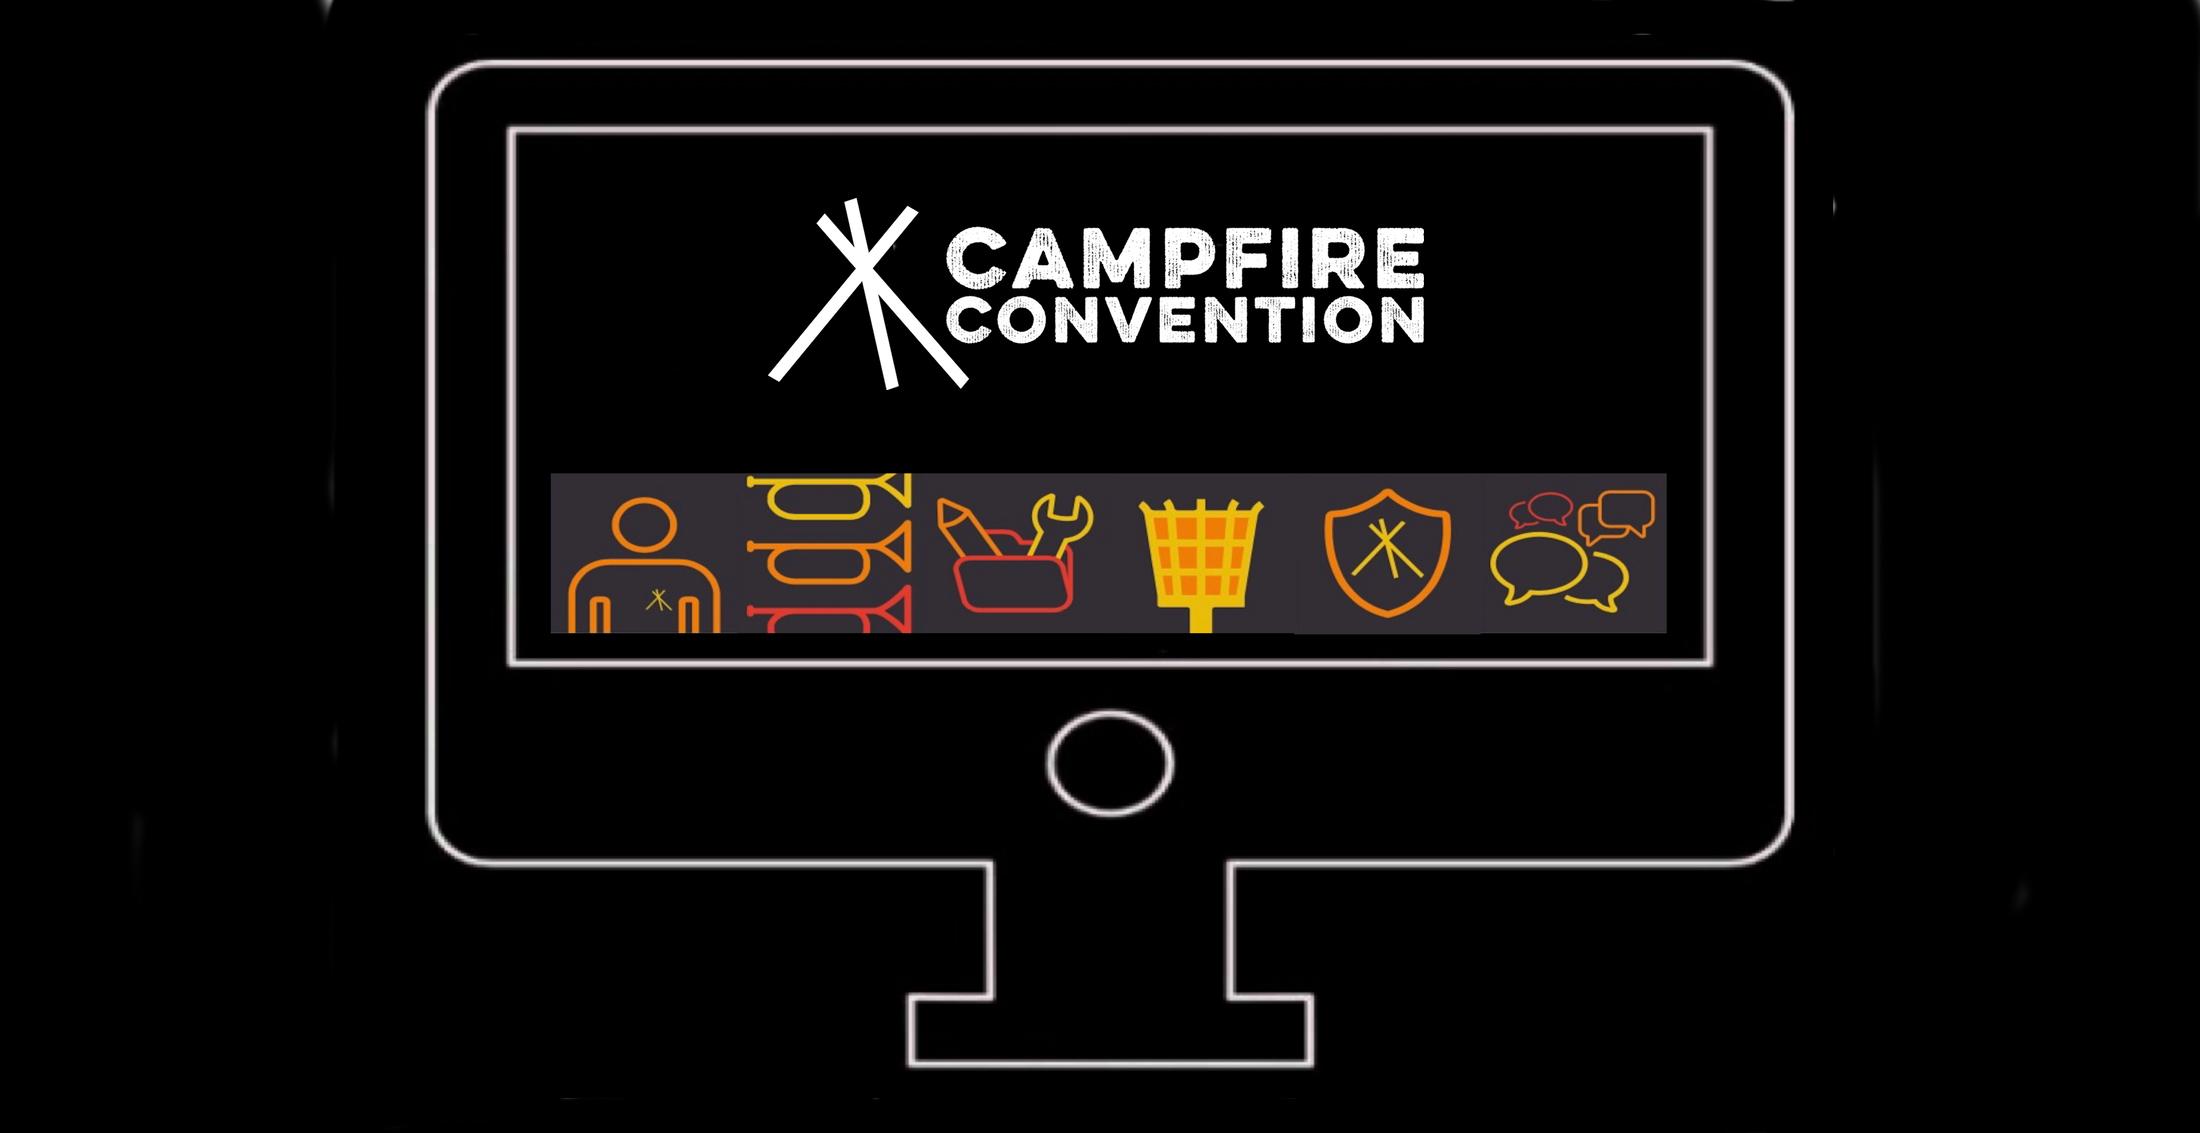 Campfire website link